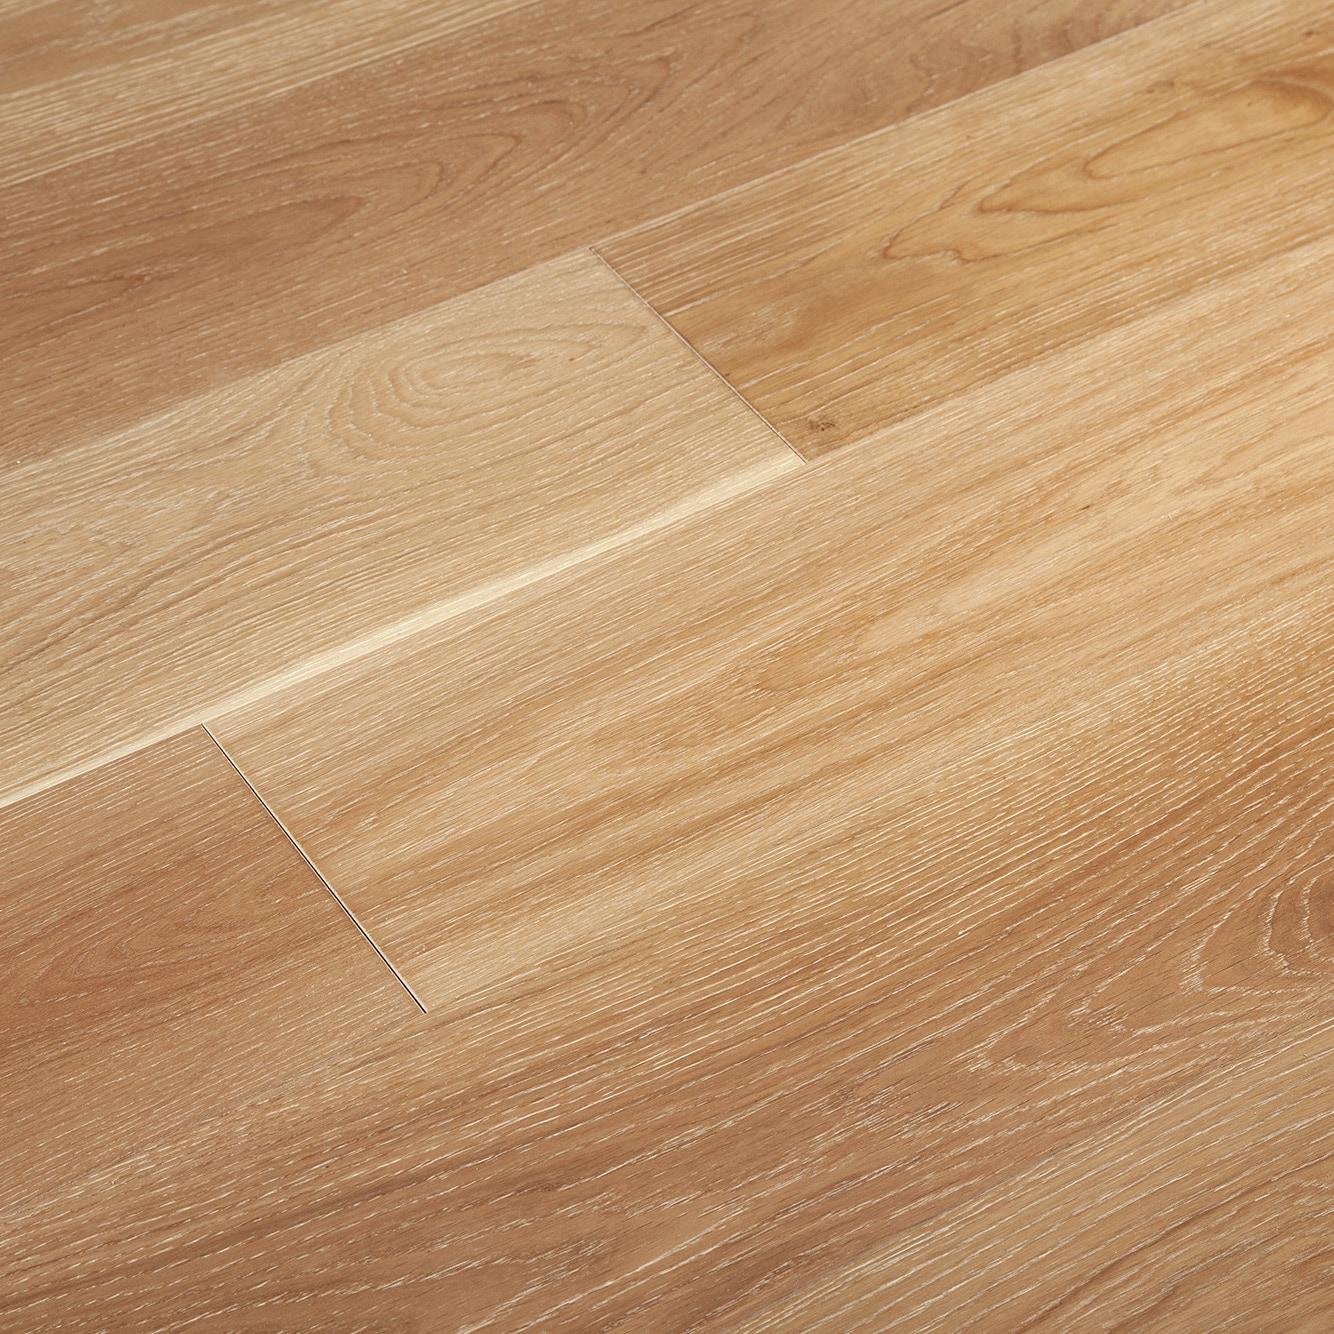 "4mm Flint White / Oak / 7 1/2"" Engineered Hardwood - Artisan Brushed Oak Collection 0"